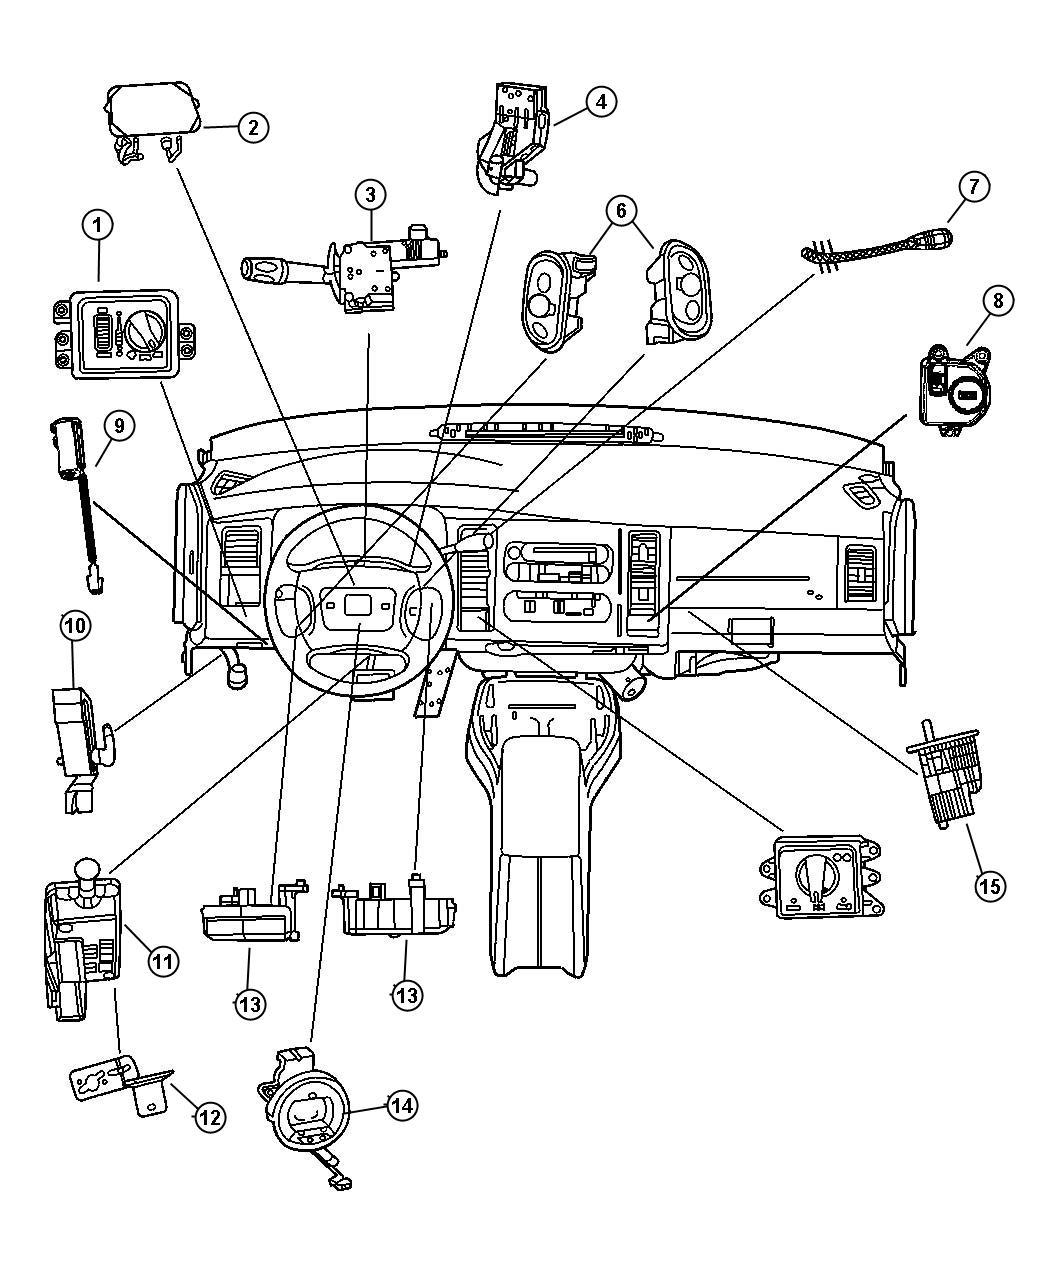 2001 Dodge Ram 3500 Switch. Parking brake. Front